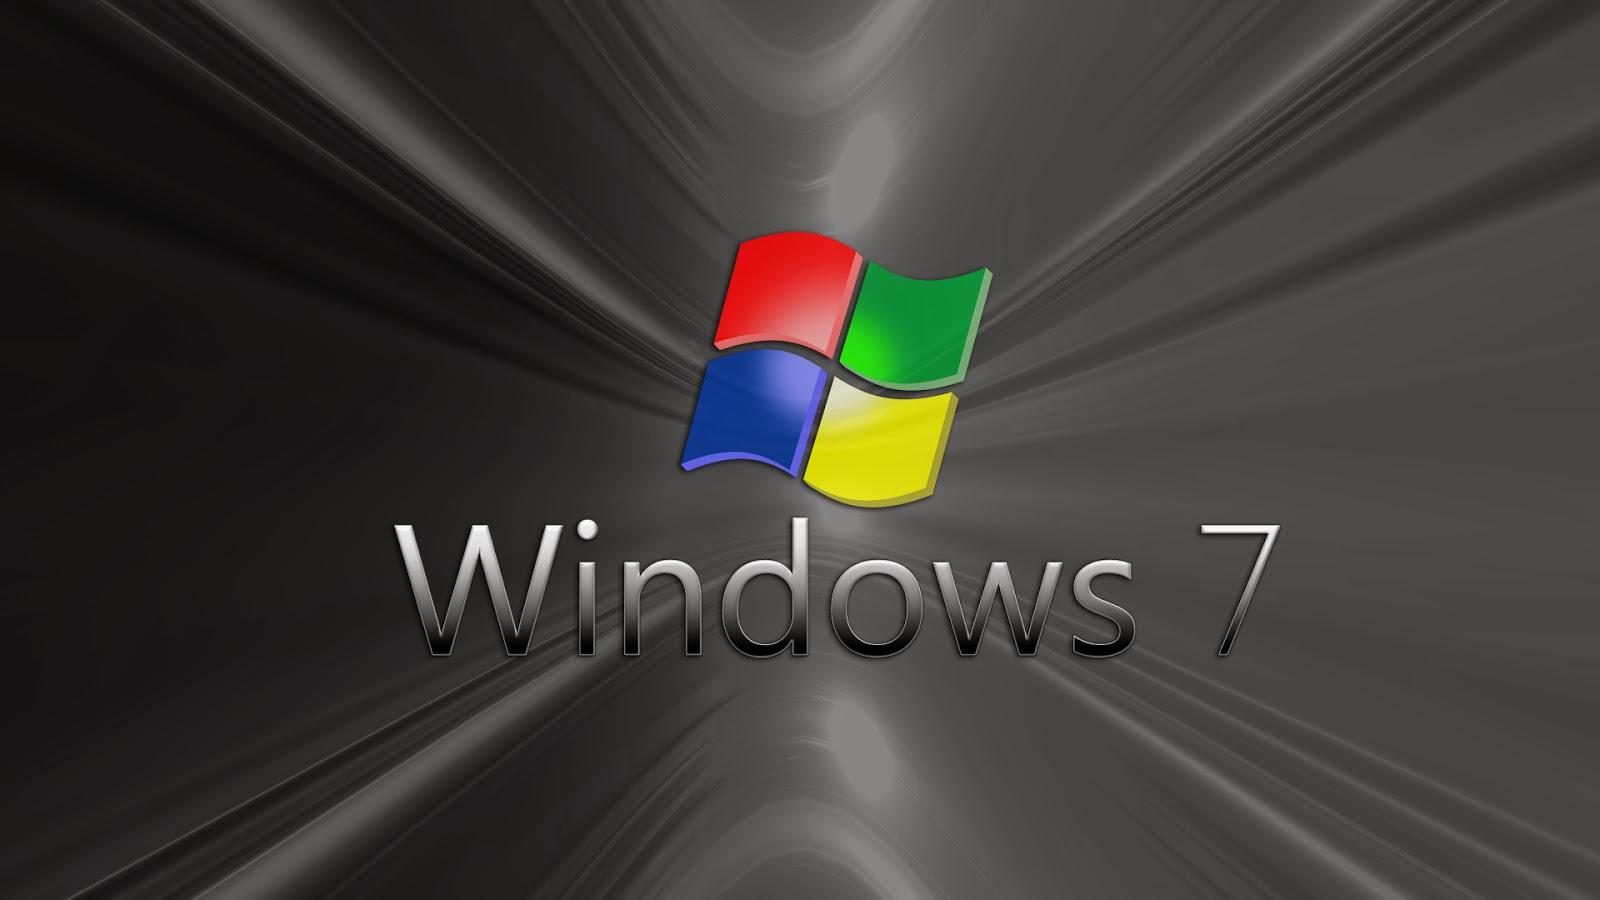 Wallpapers Hd Para Facebook Imagenes Zt Descarga Fondos Hd Fondo De Pantalla Windows 7